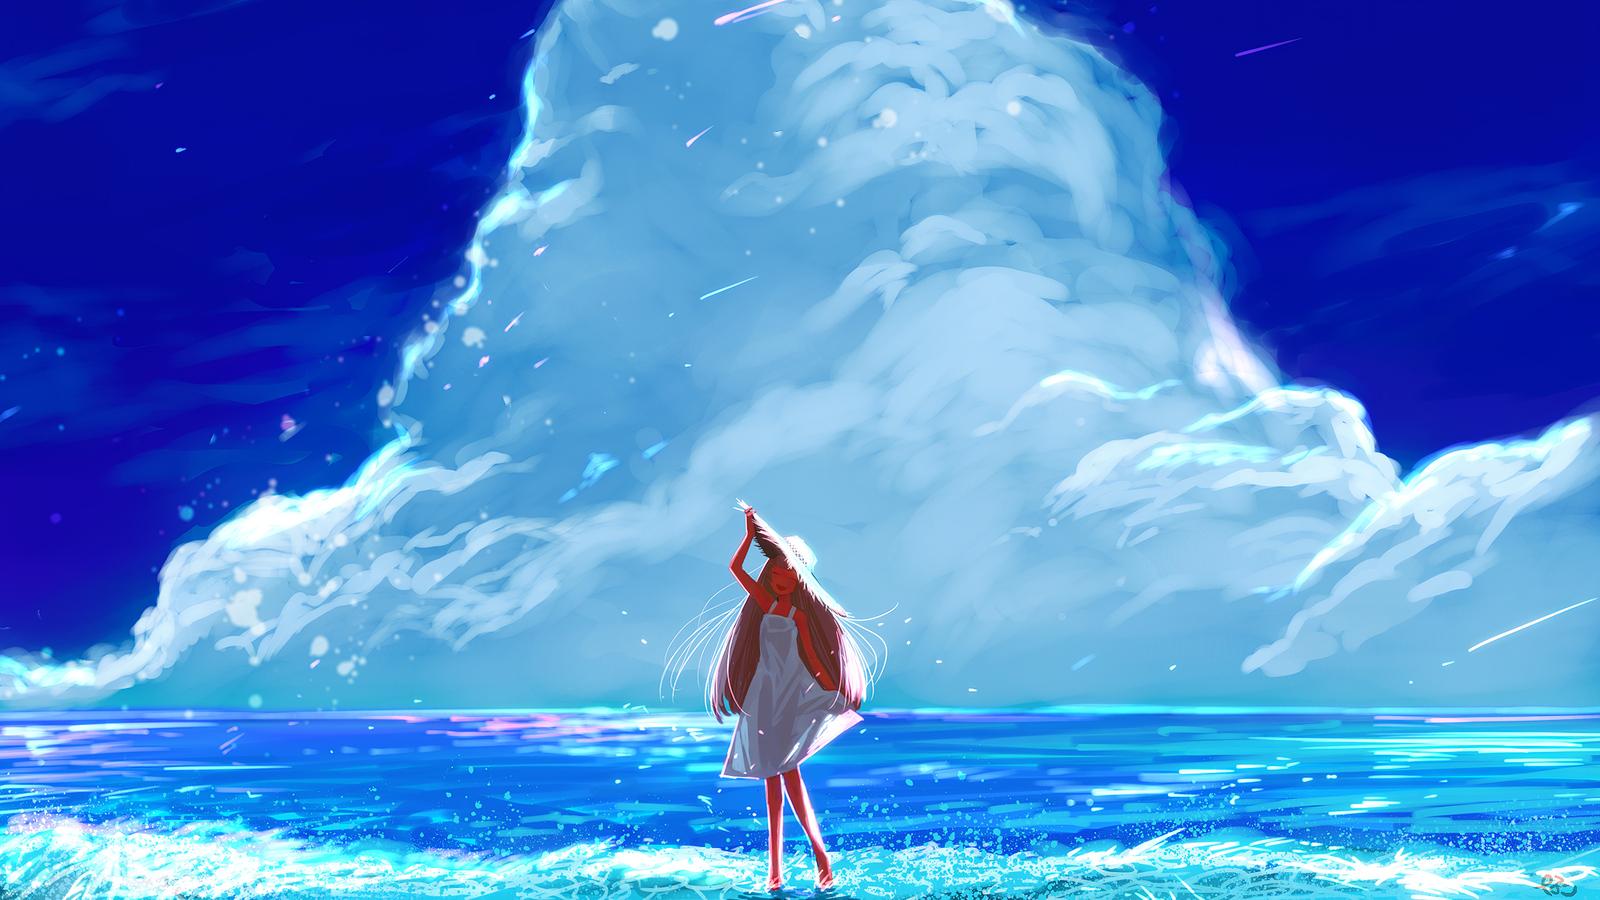 anime-girl-beach-happy-long-hair-clouds-4k-rh.jpg